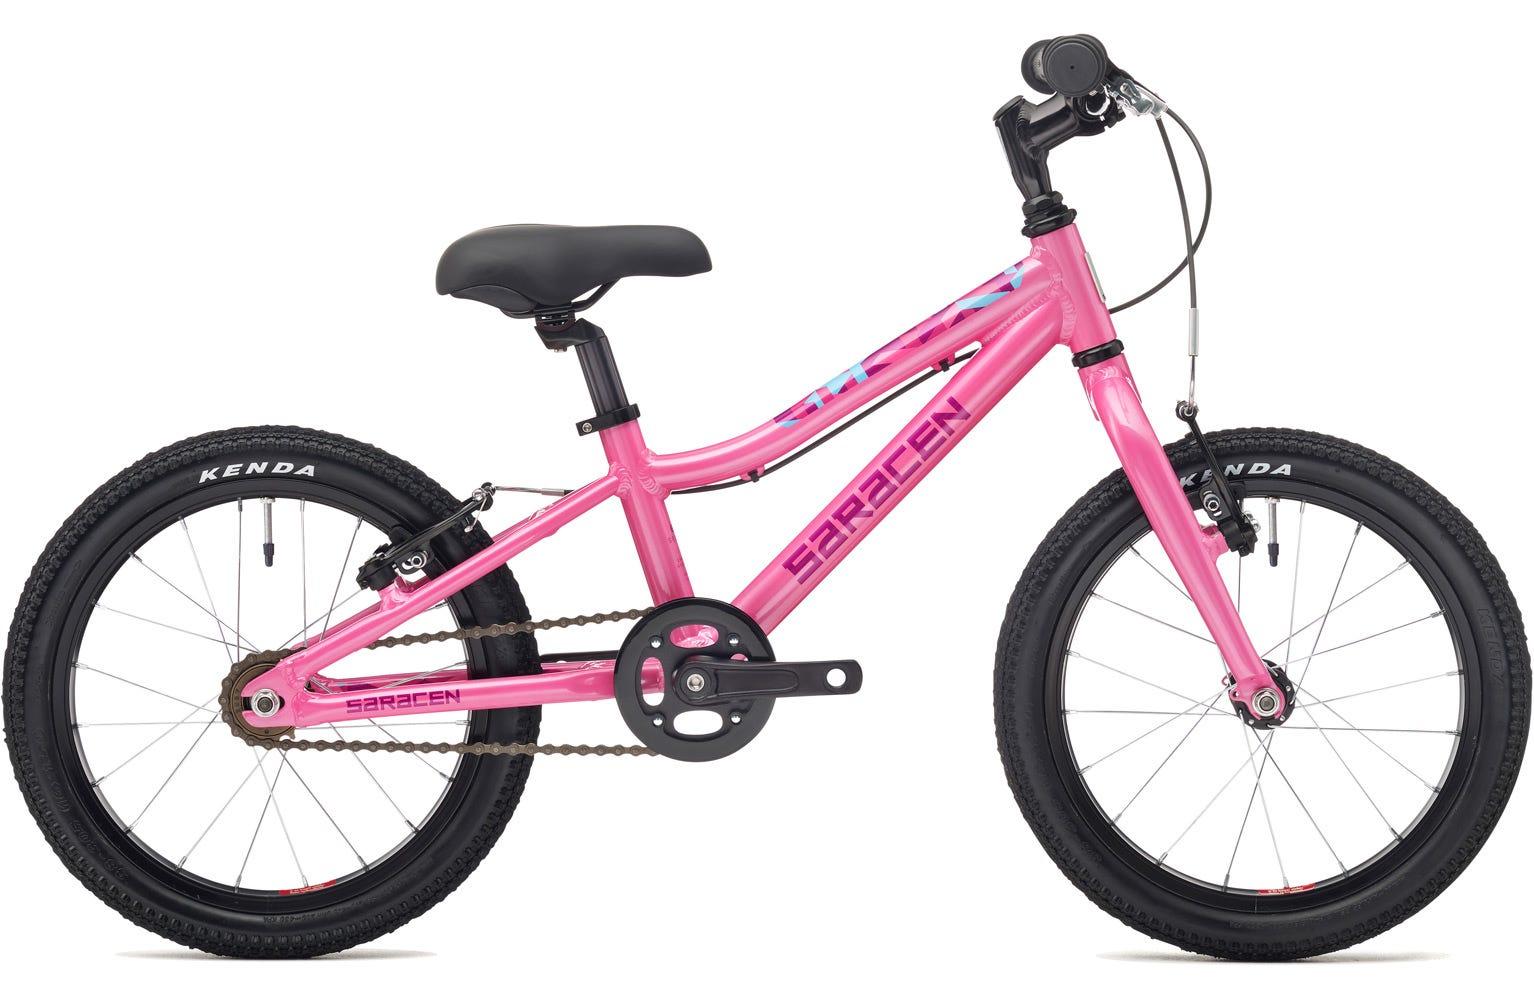 Saracen Mantra 1.6 Girls bike